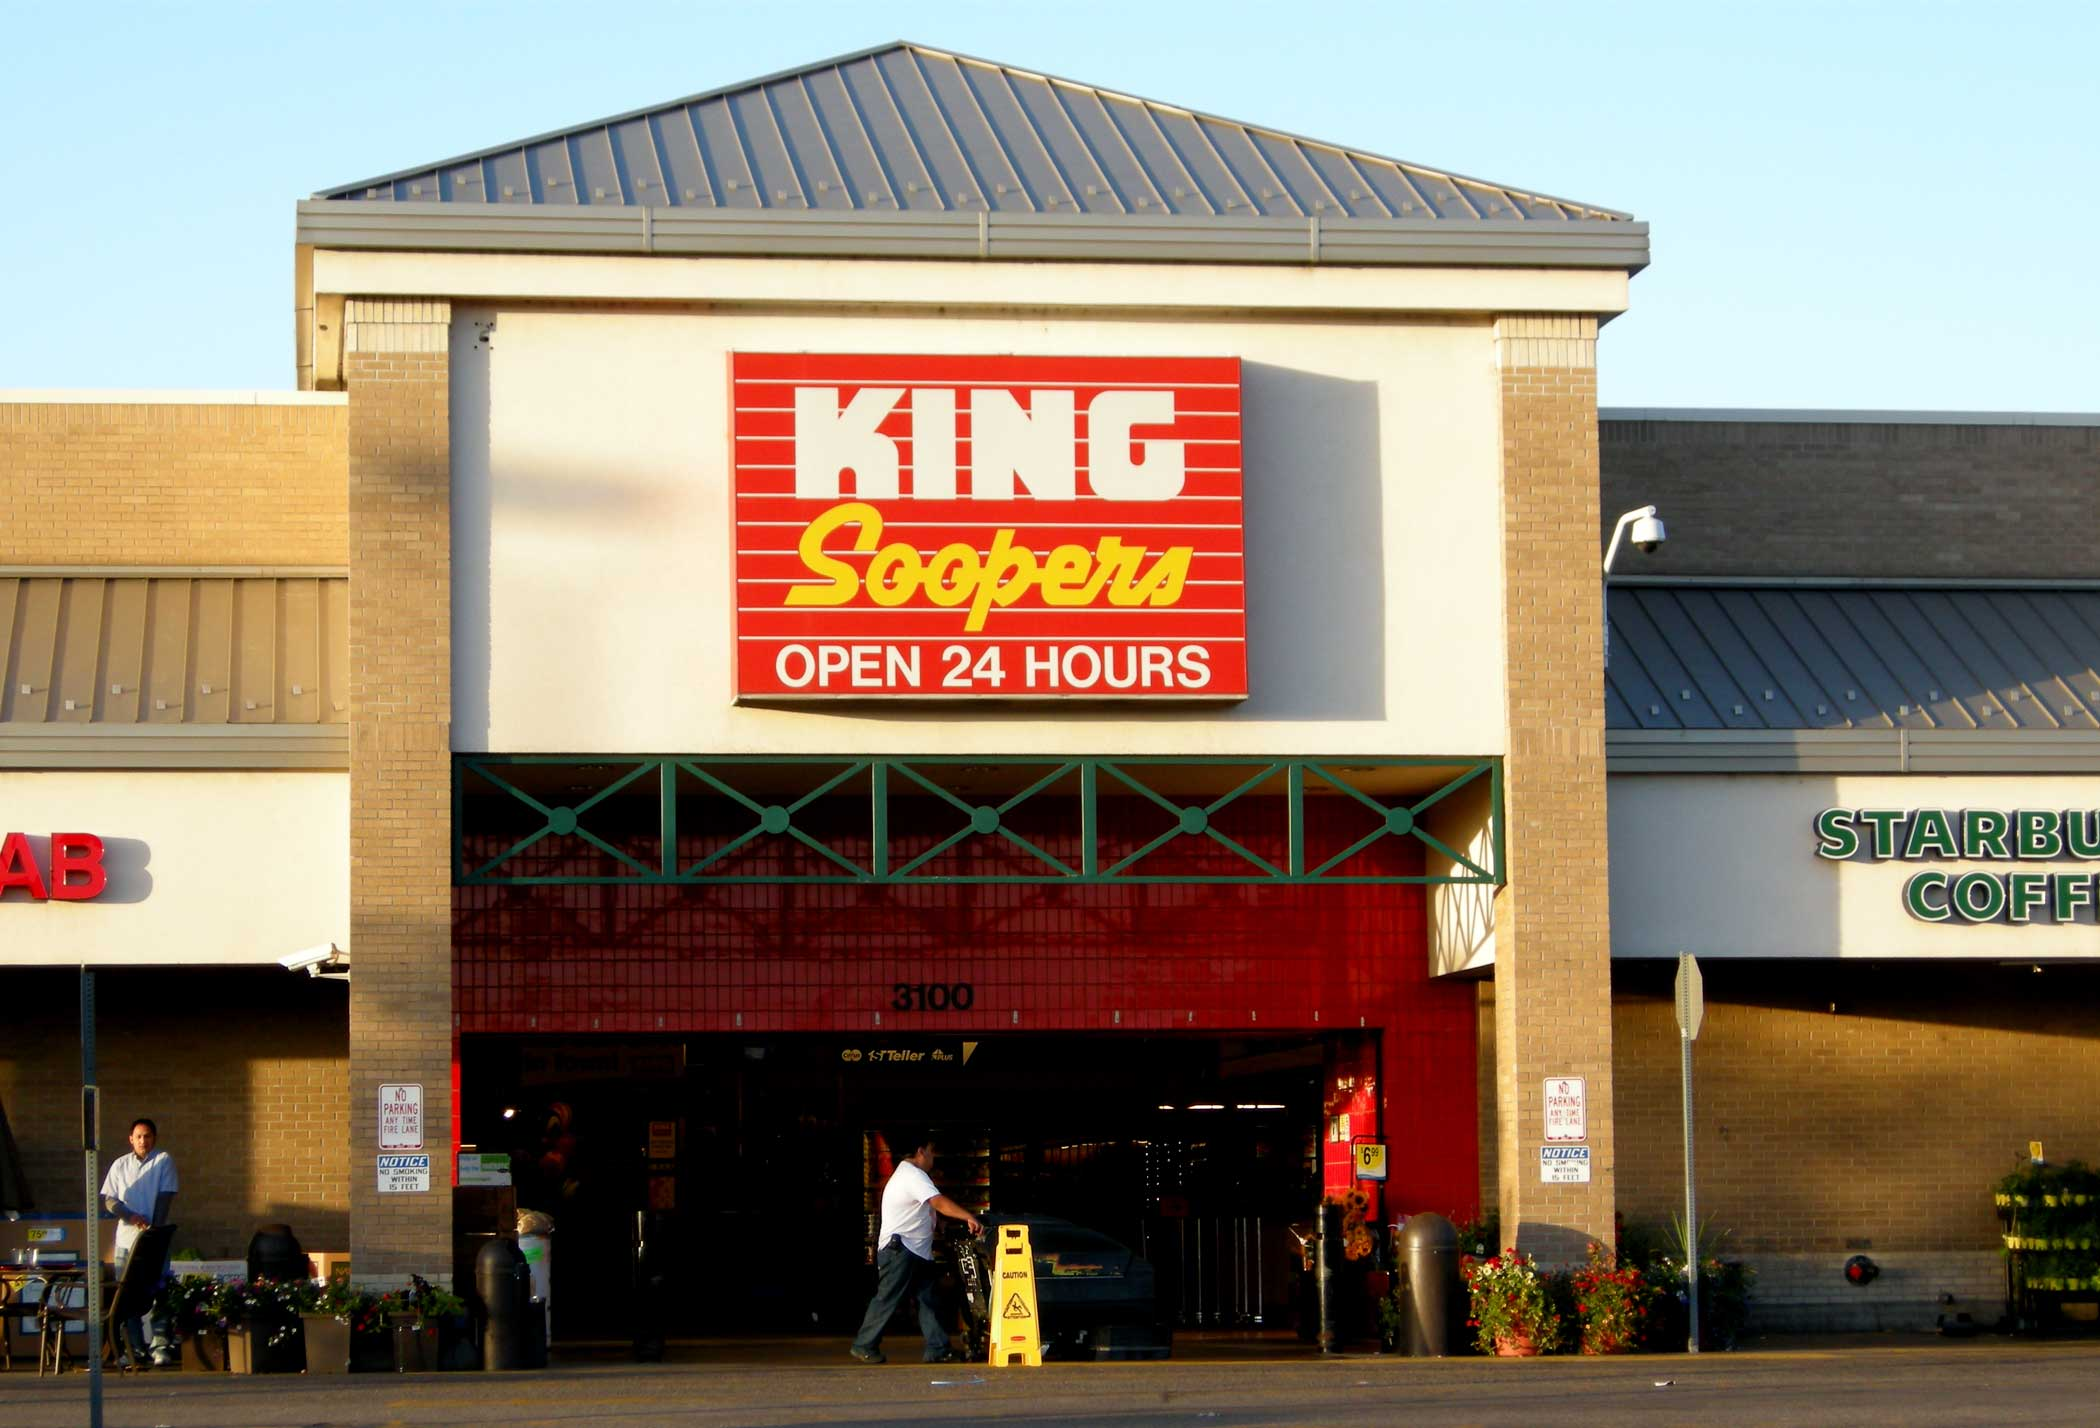 File:KingSoopers-DenverCO.jpg - Wikimedia Commons